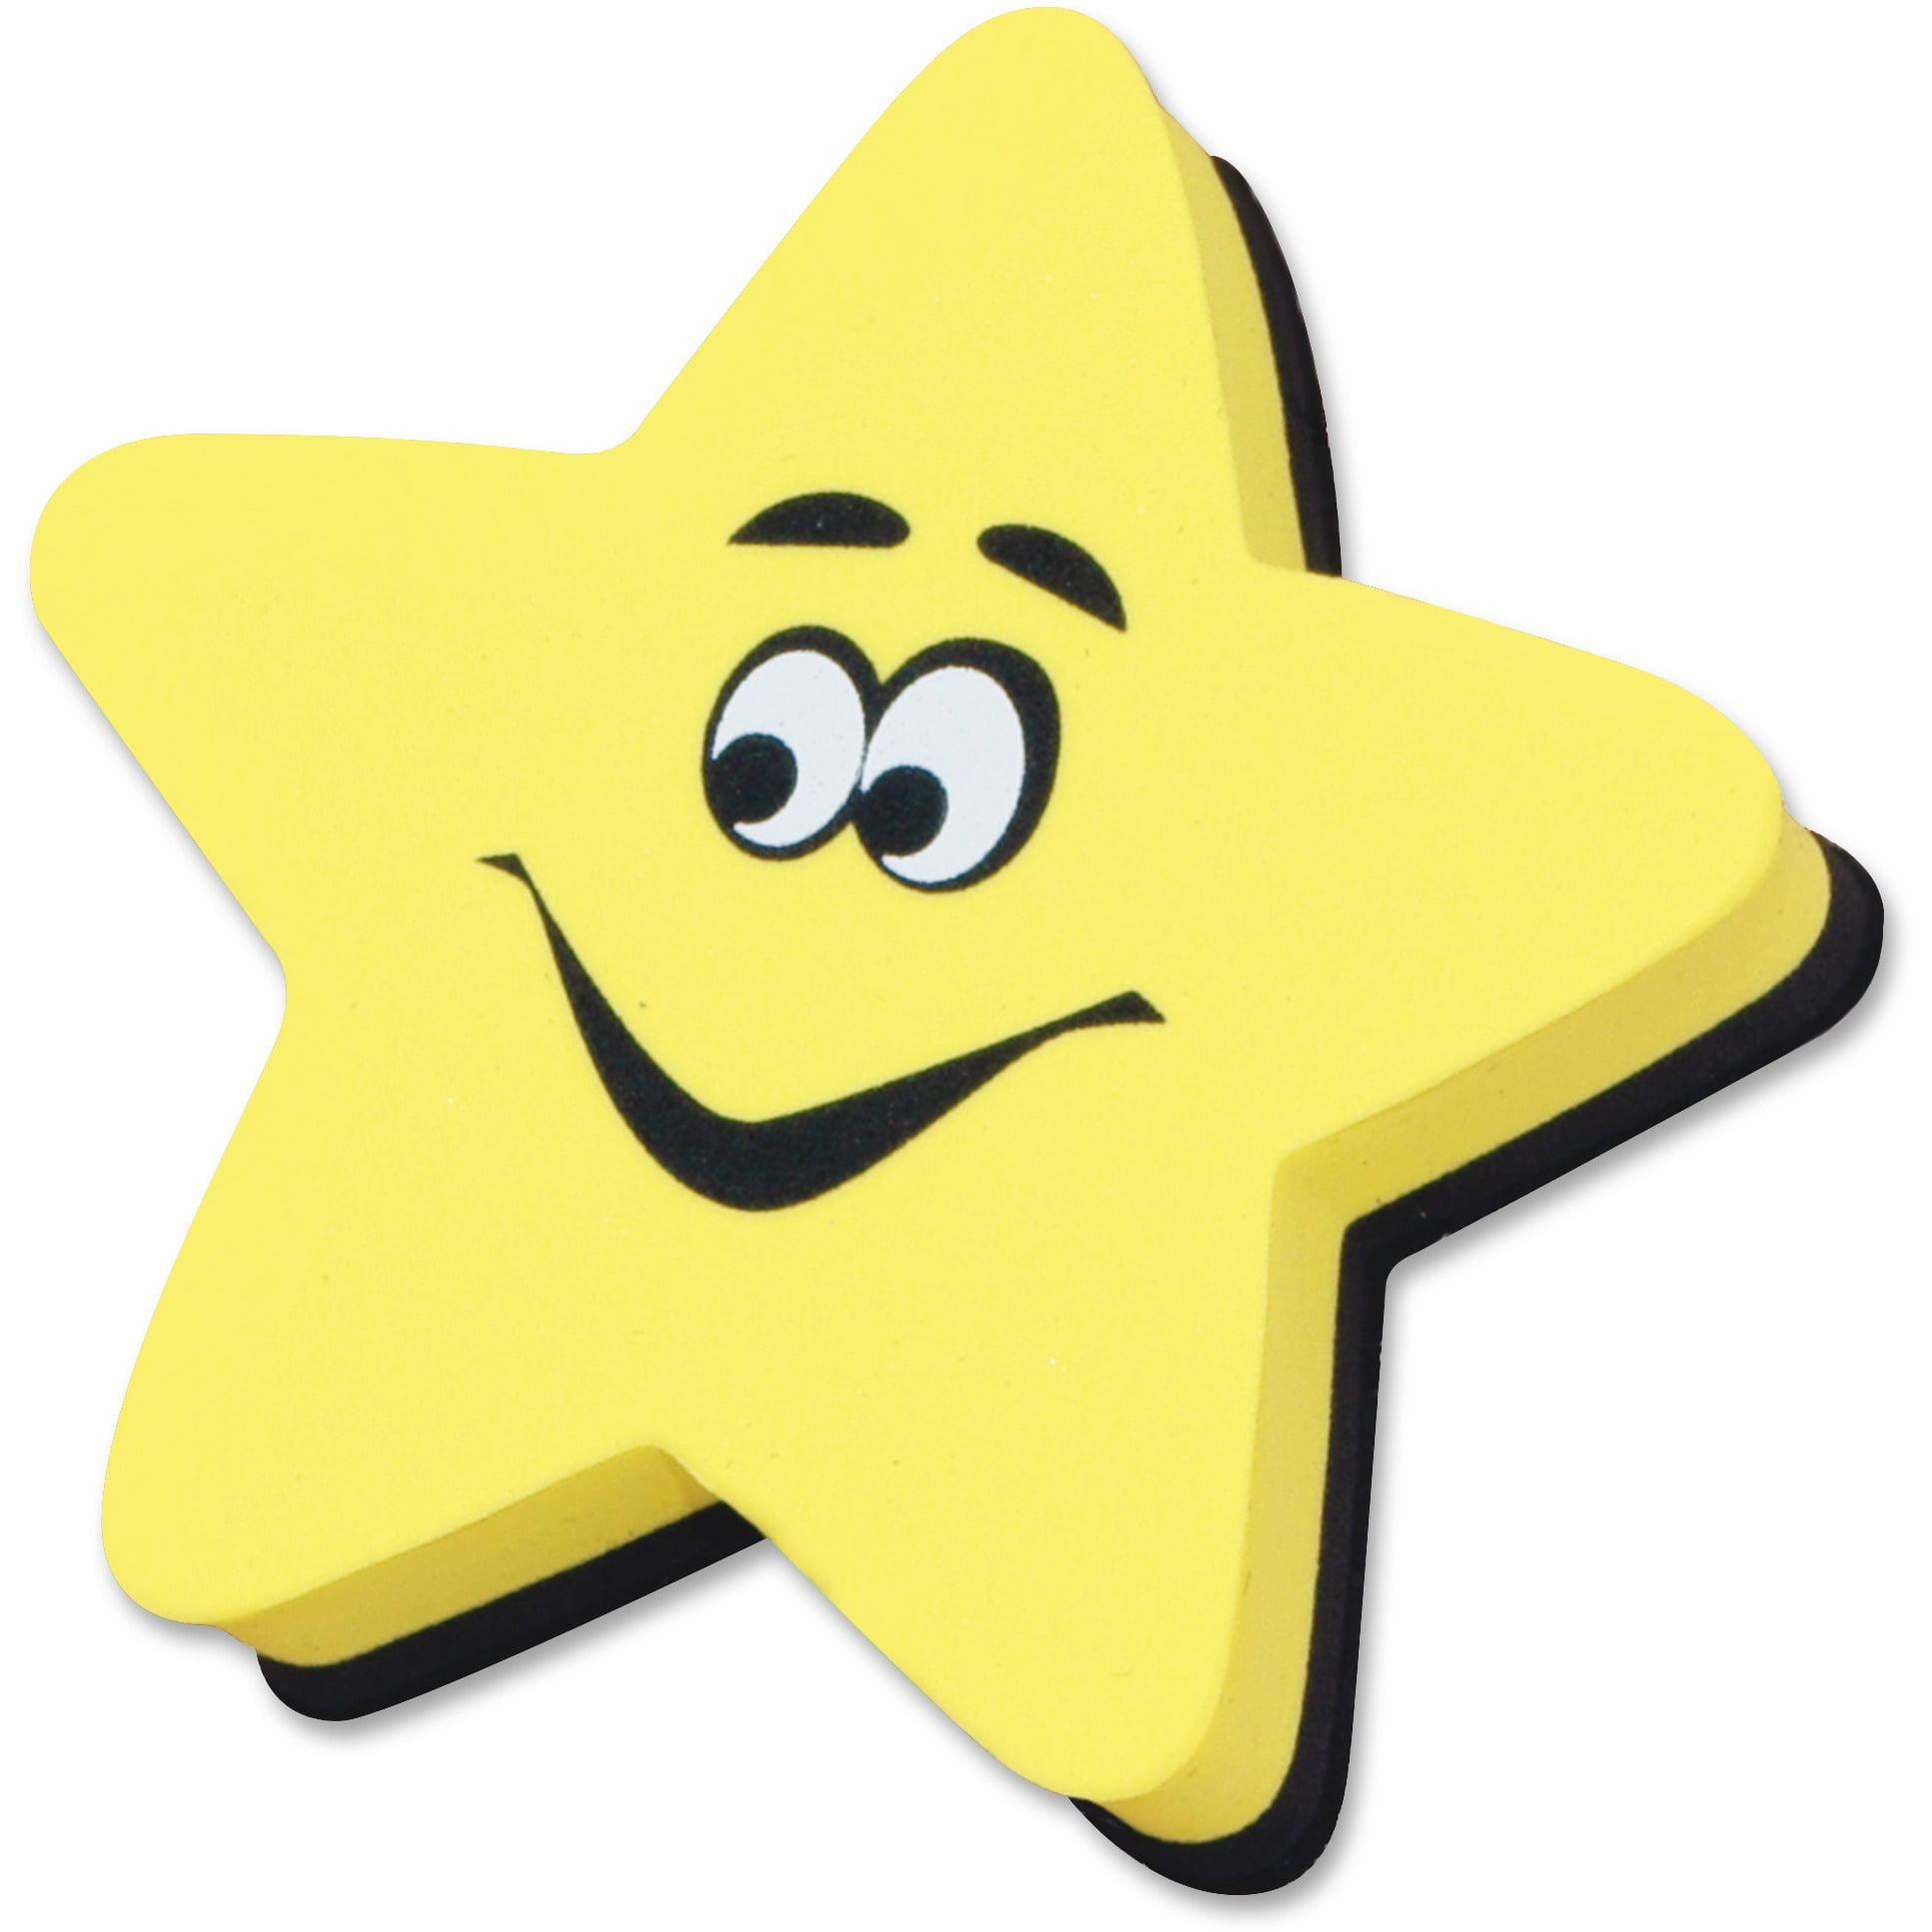 Ashley, ASH10016, Yellow Star Magnetic WhiteBoard Eraser, 1 Each, Yellow